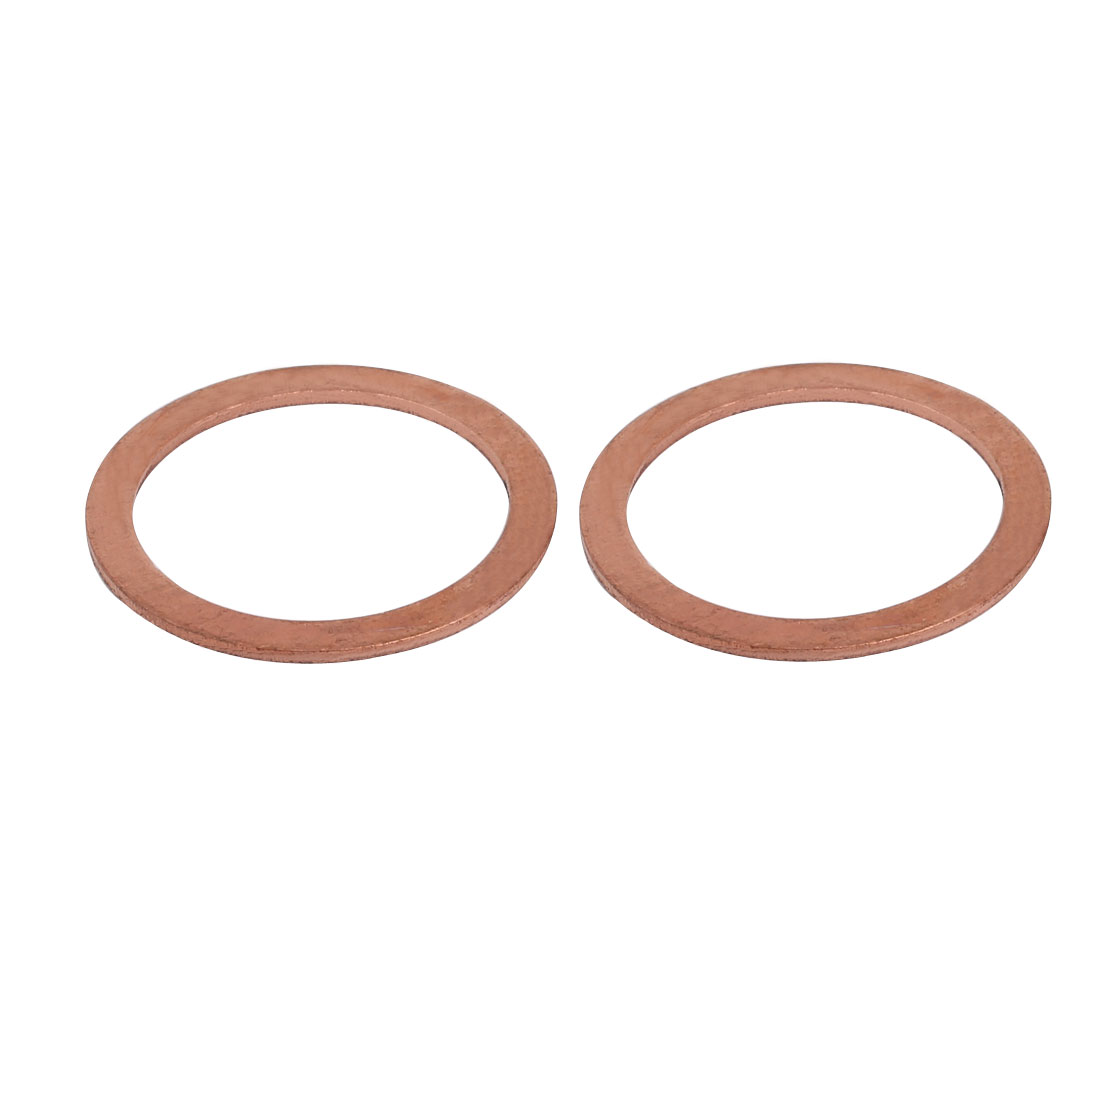 2pcs 33mmx42mmx1.5mm Copper Flat Ring Sealing Crush Washer Gasket